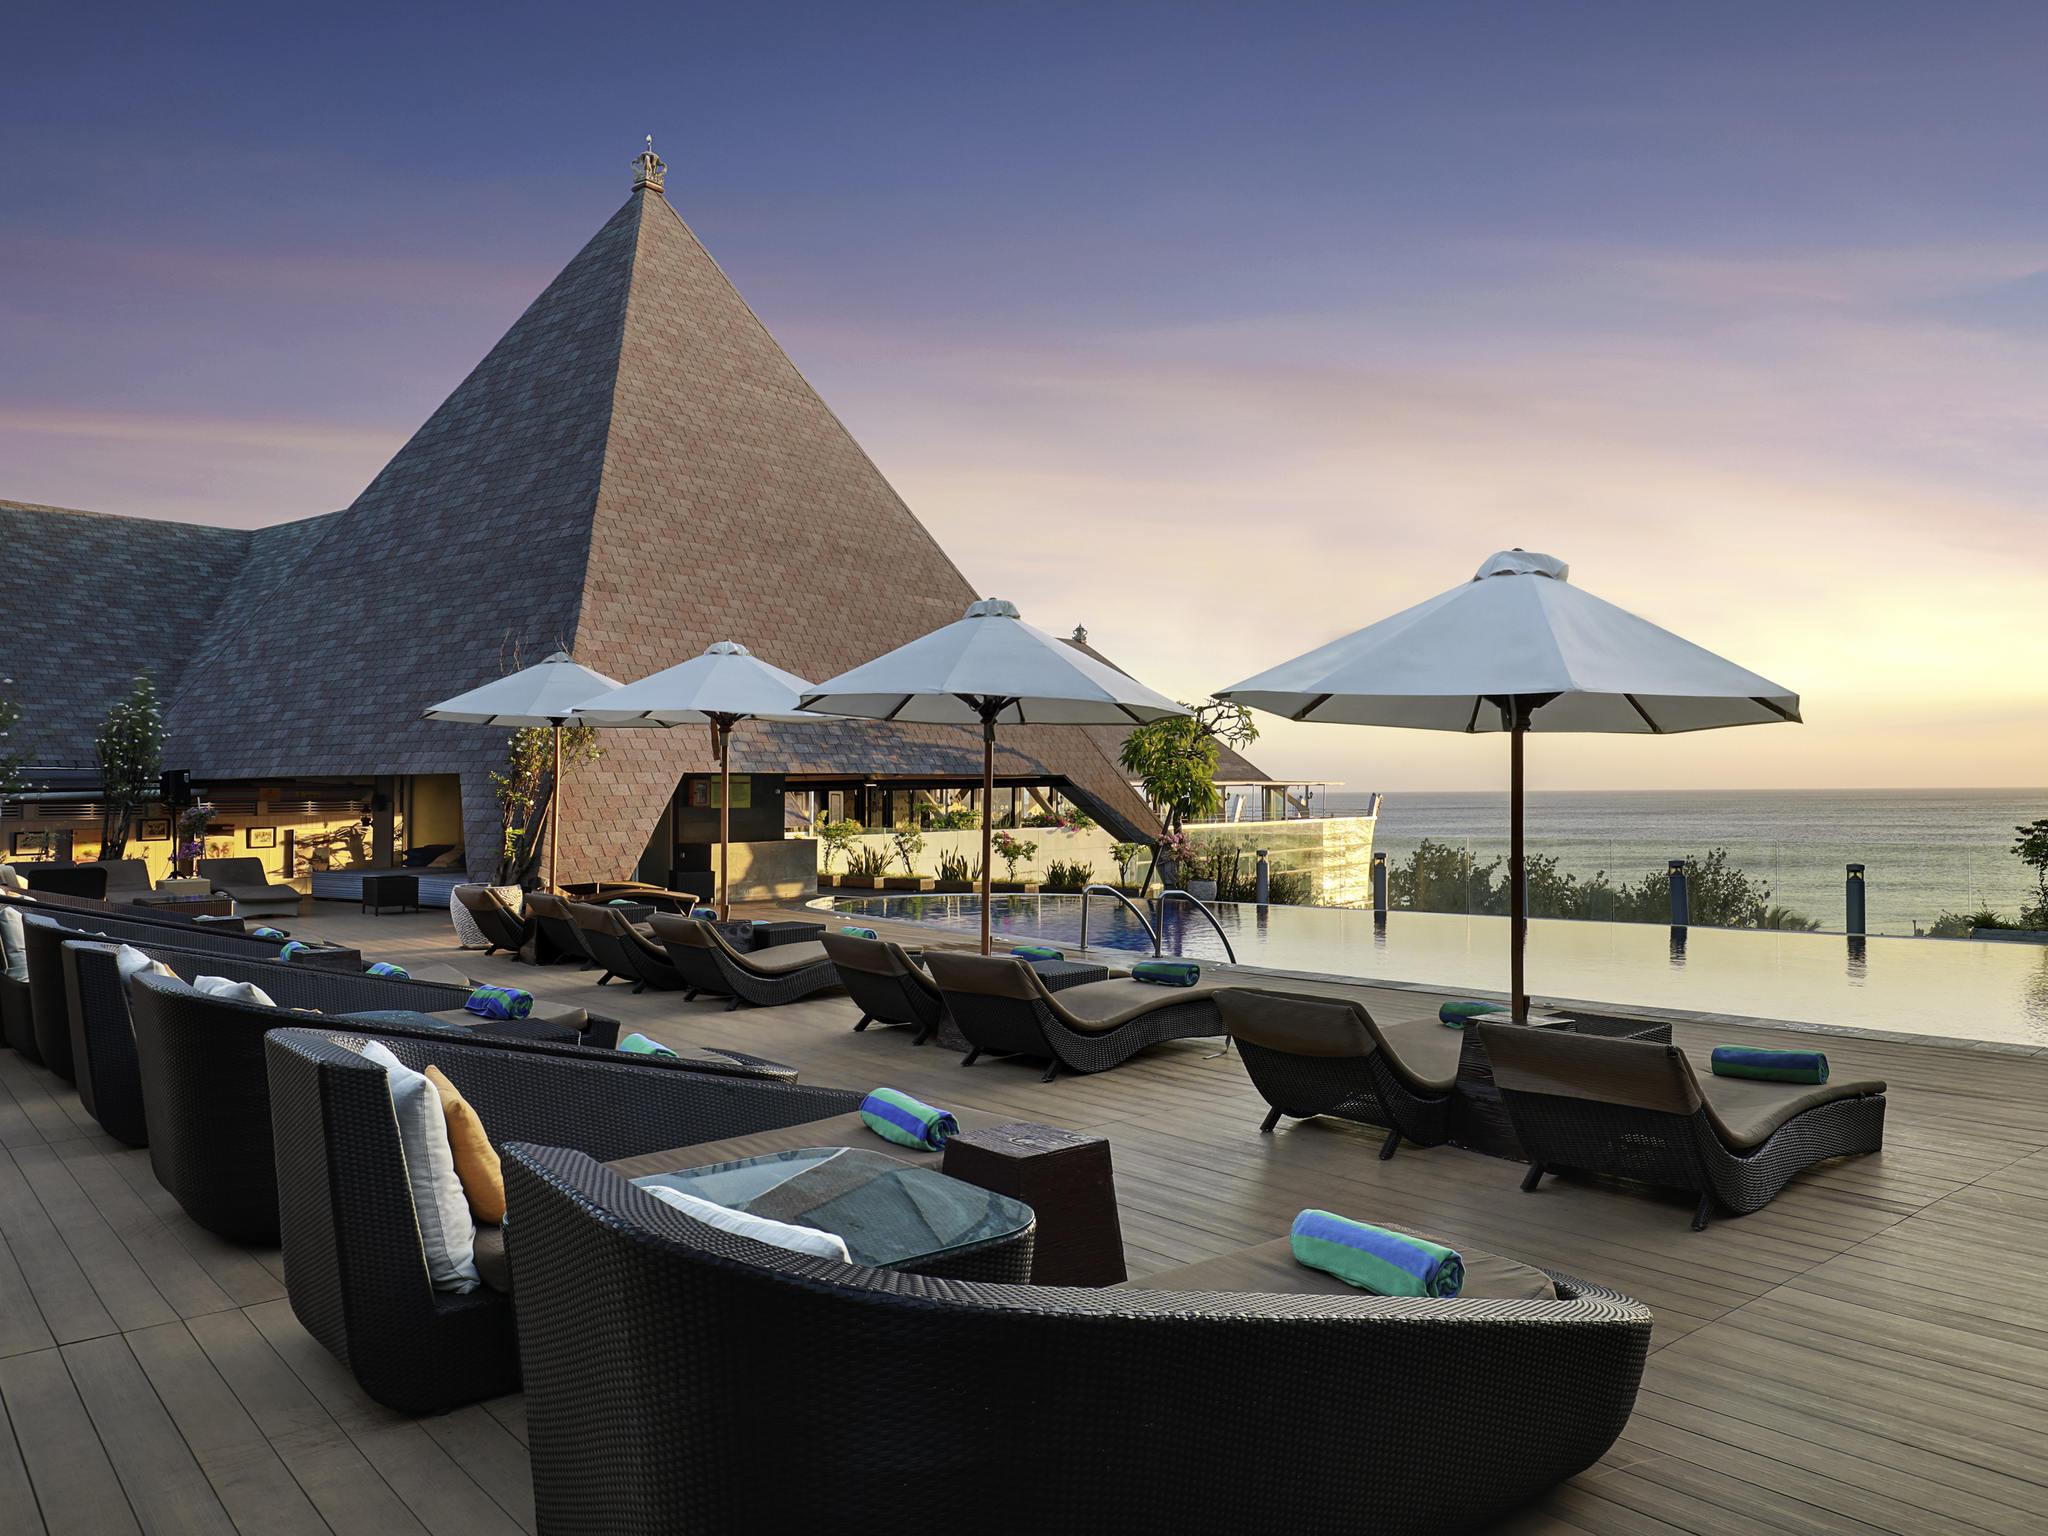 Hotel - The Kuta Beach Heritage Hotel Bali - Managed by AccorHotels